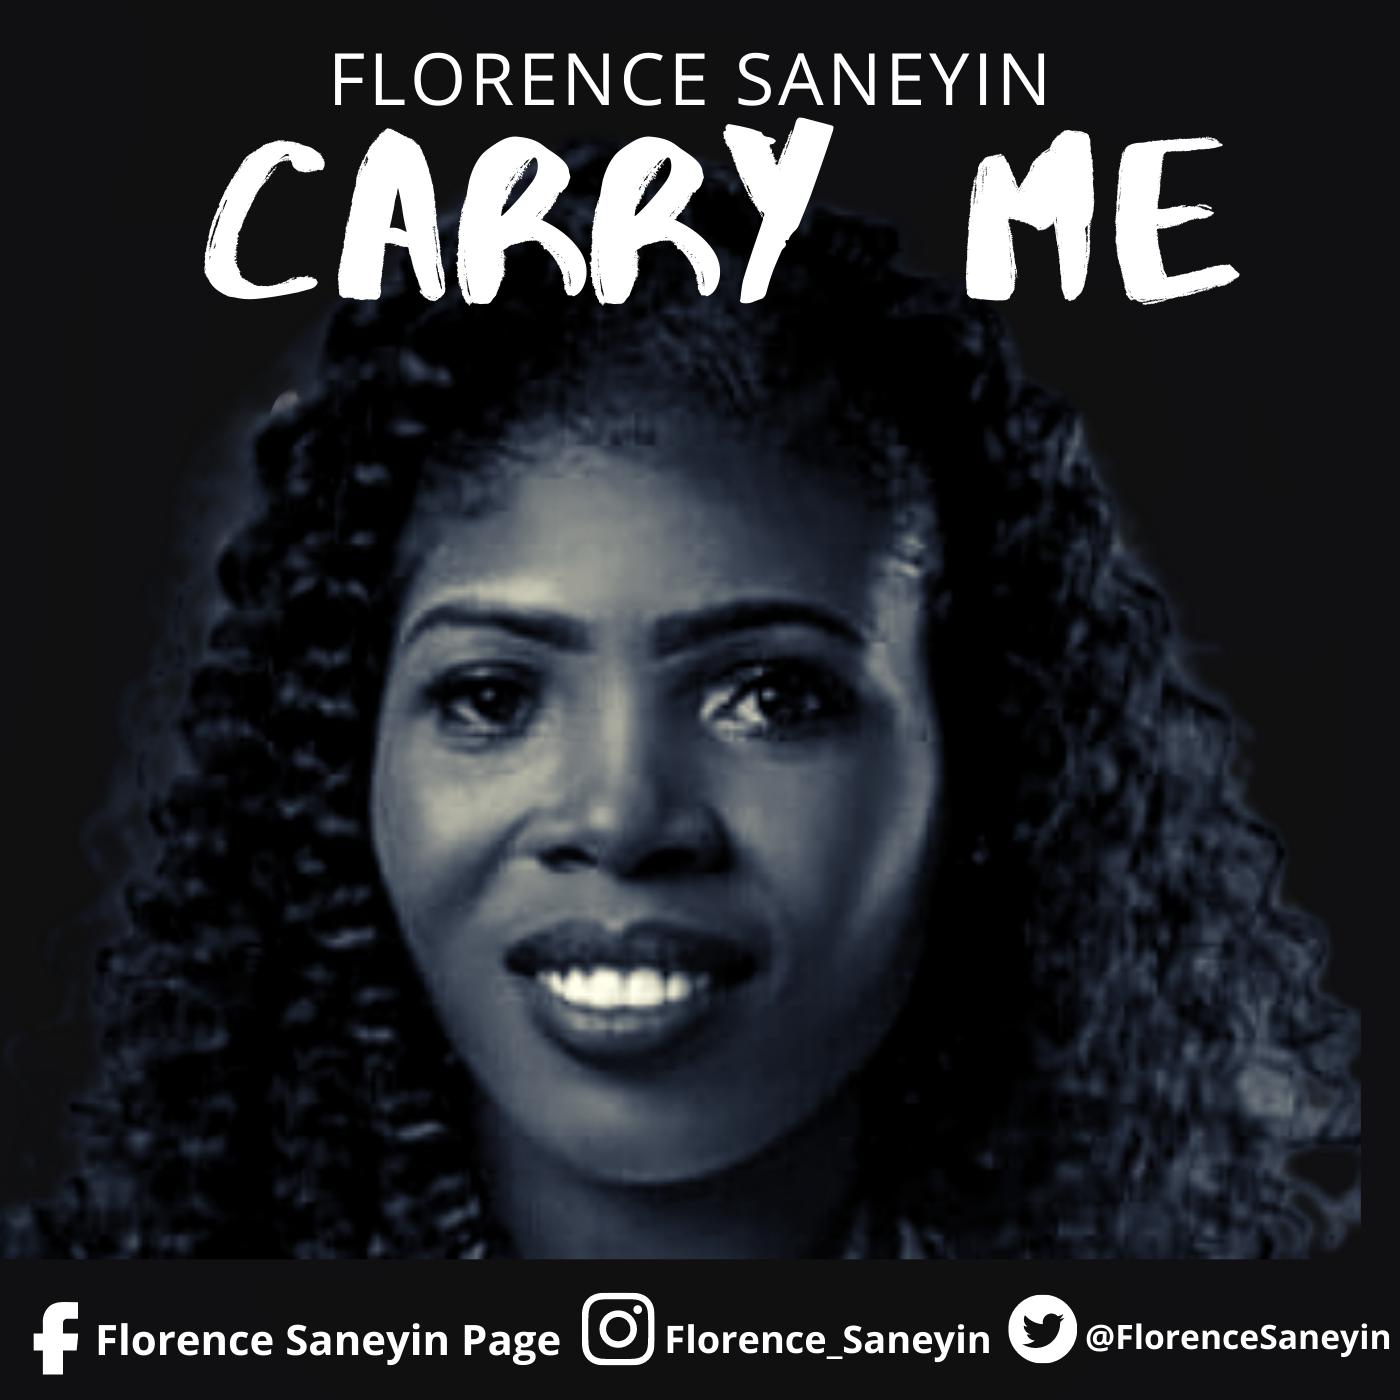 CARRY ME - Florence Saneyin    [@FlorenceSaneyin]